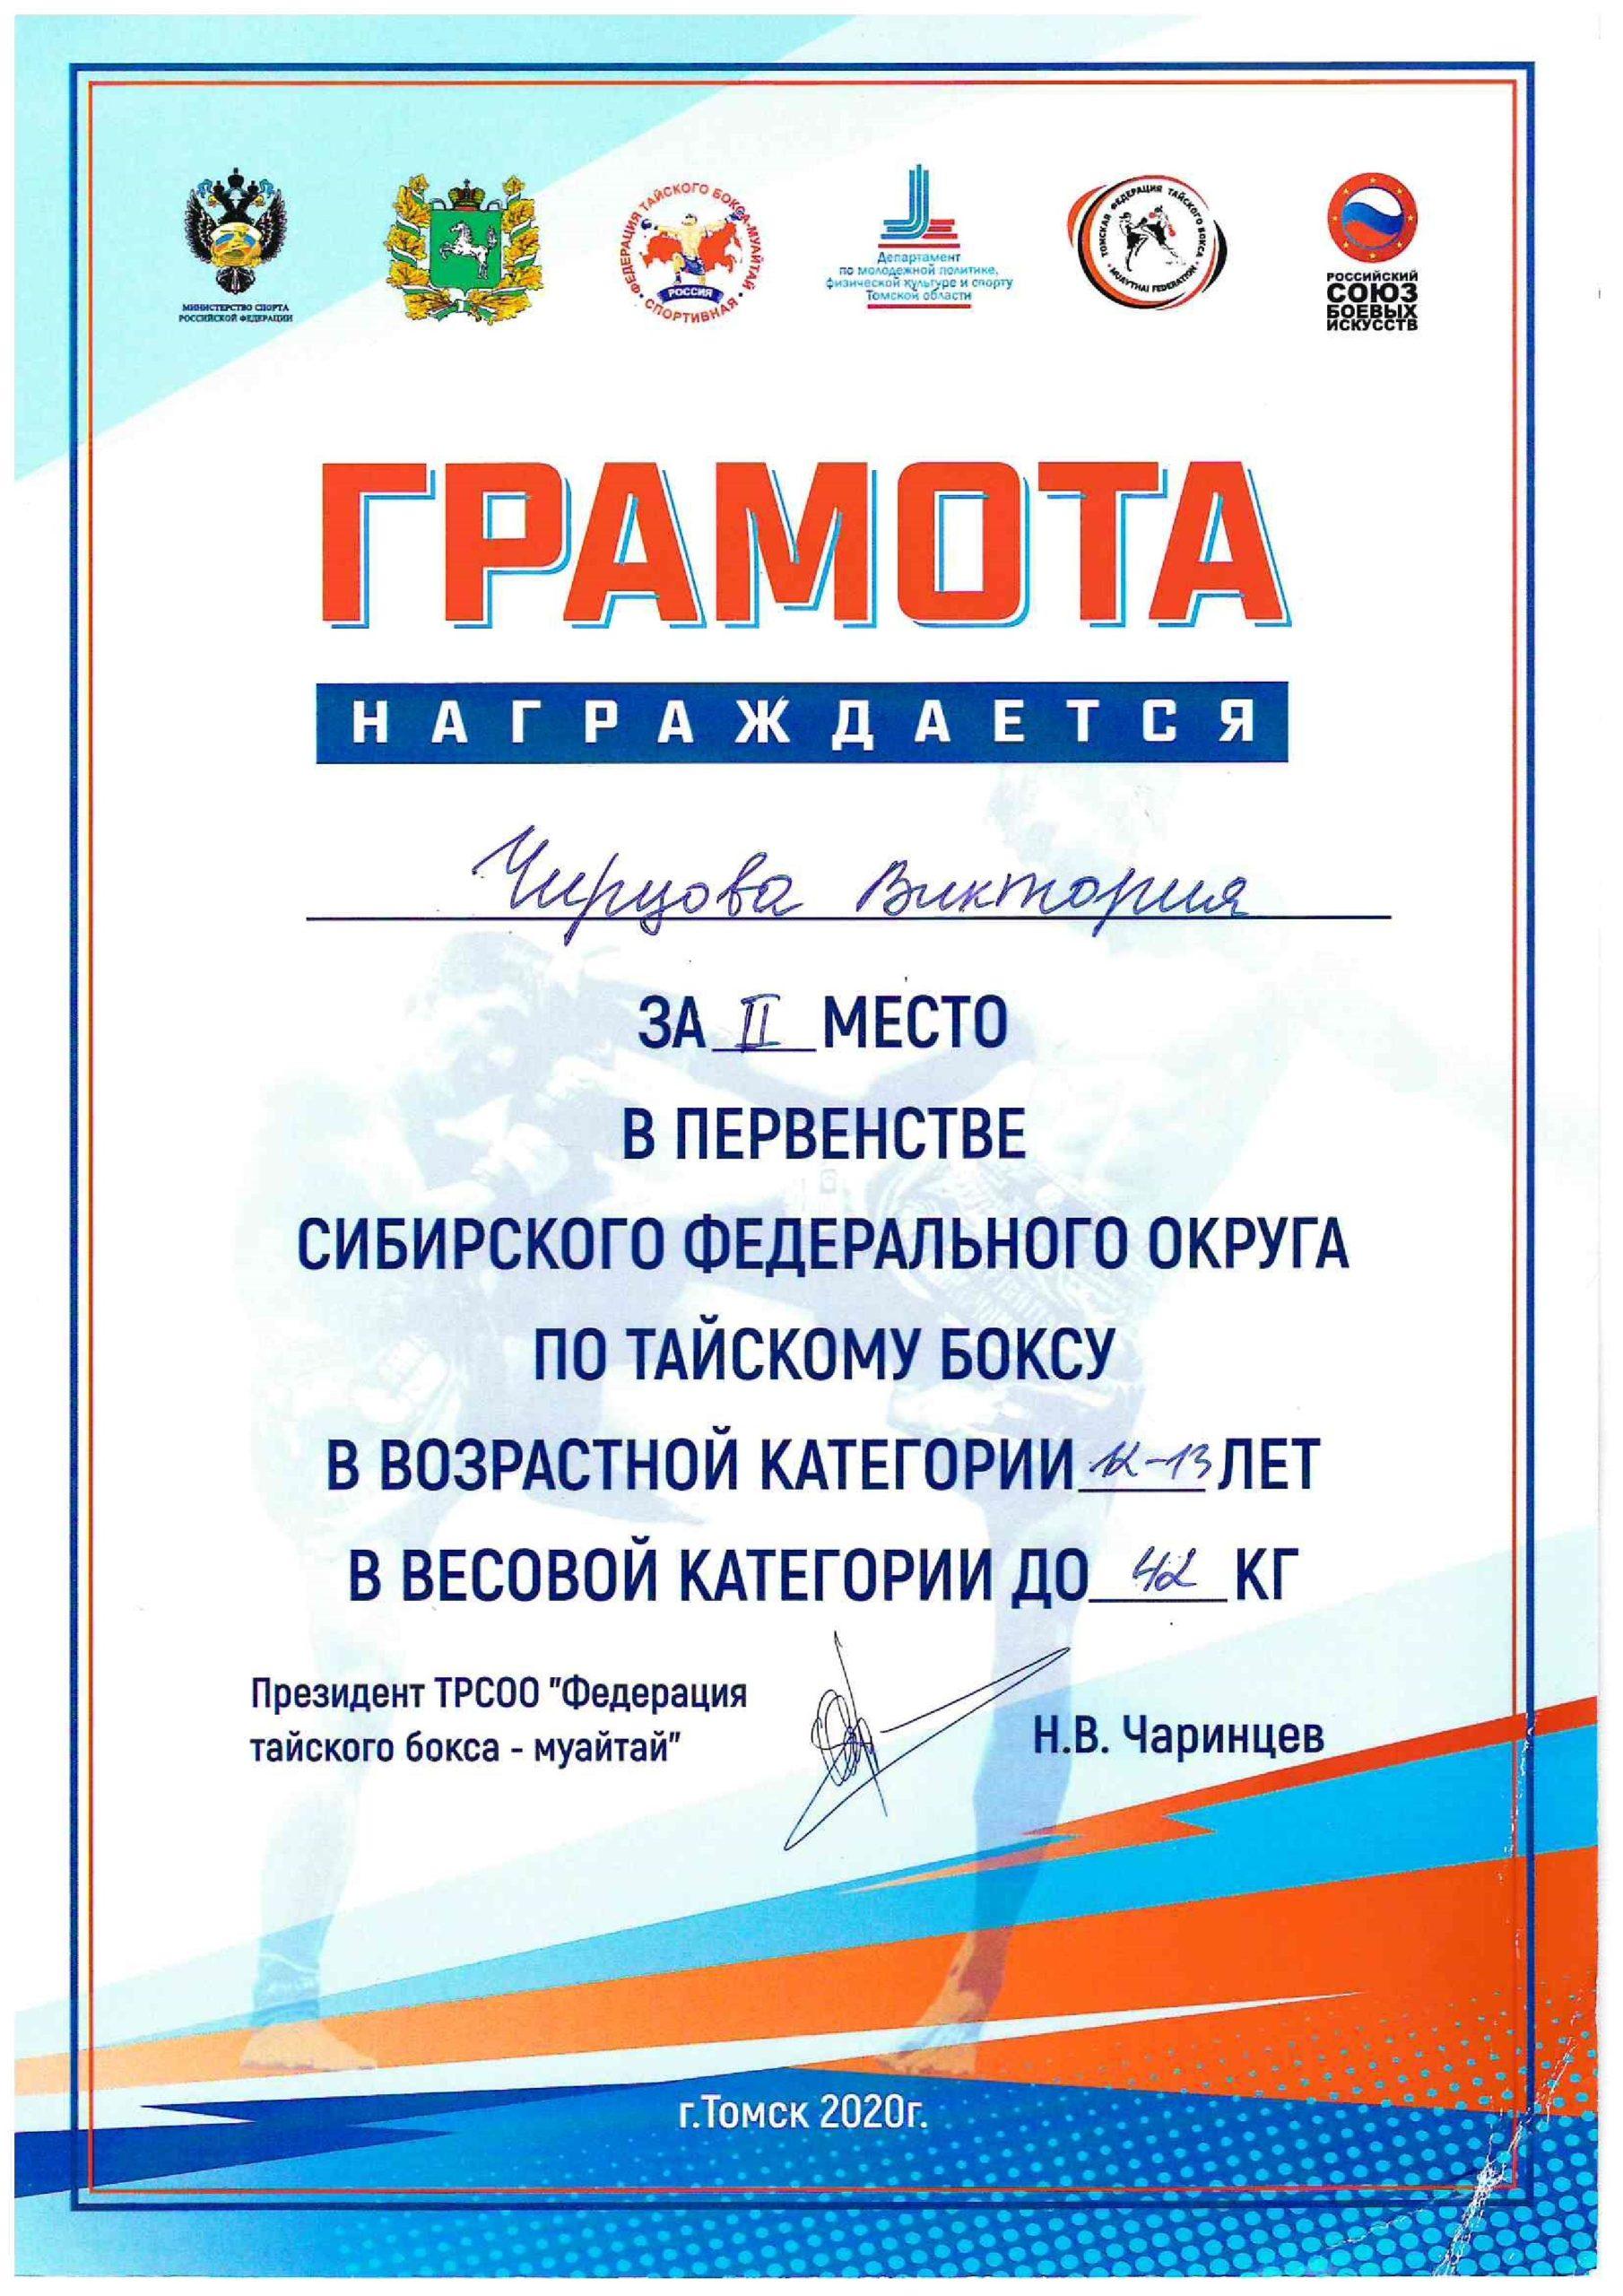 Чирцова Вероника 2 место (1)_1